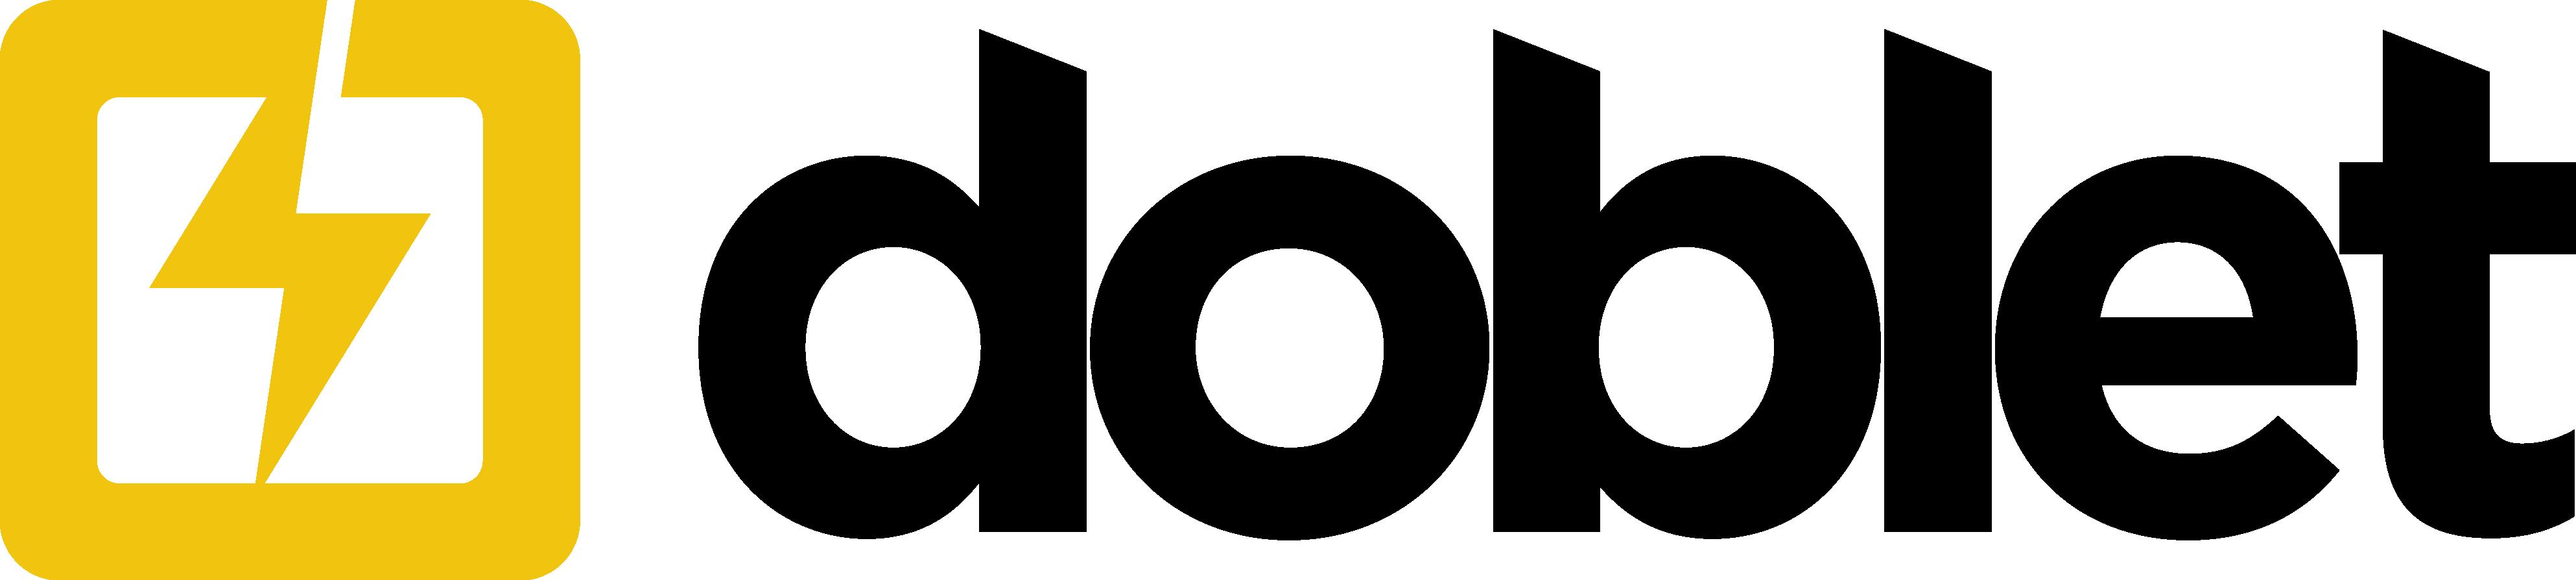 doblet-logo